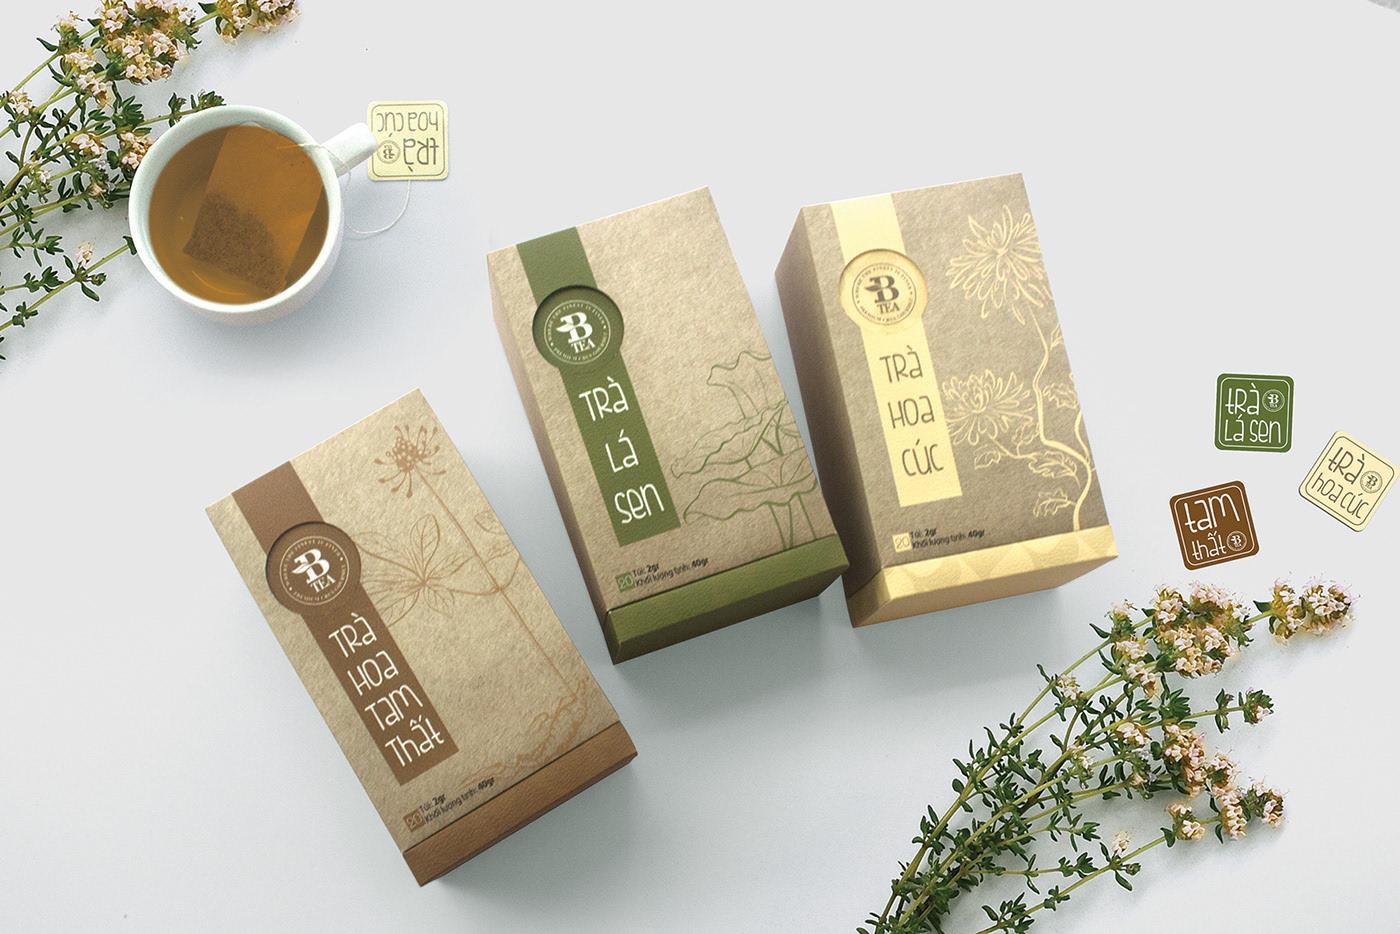 BTEA 越南花茶礼盒8